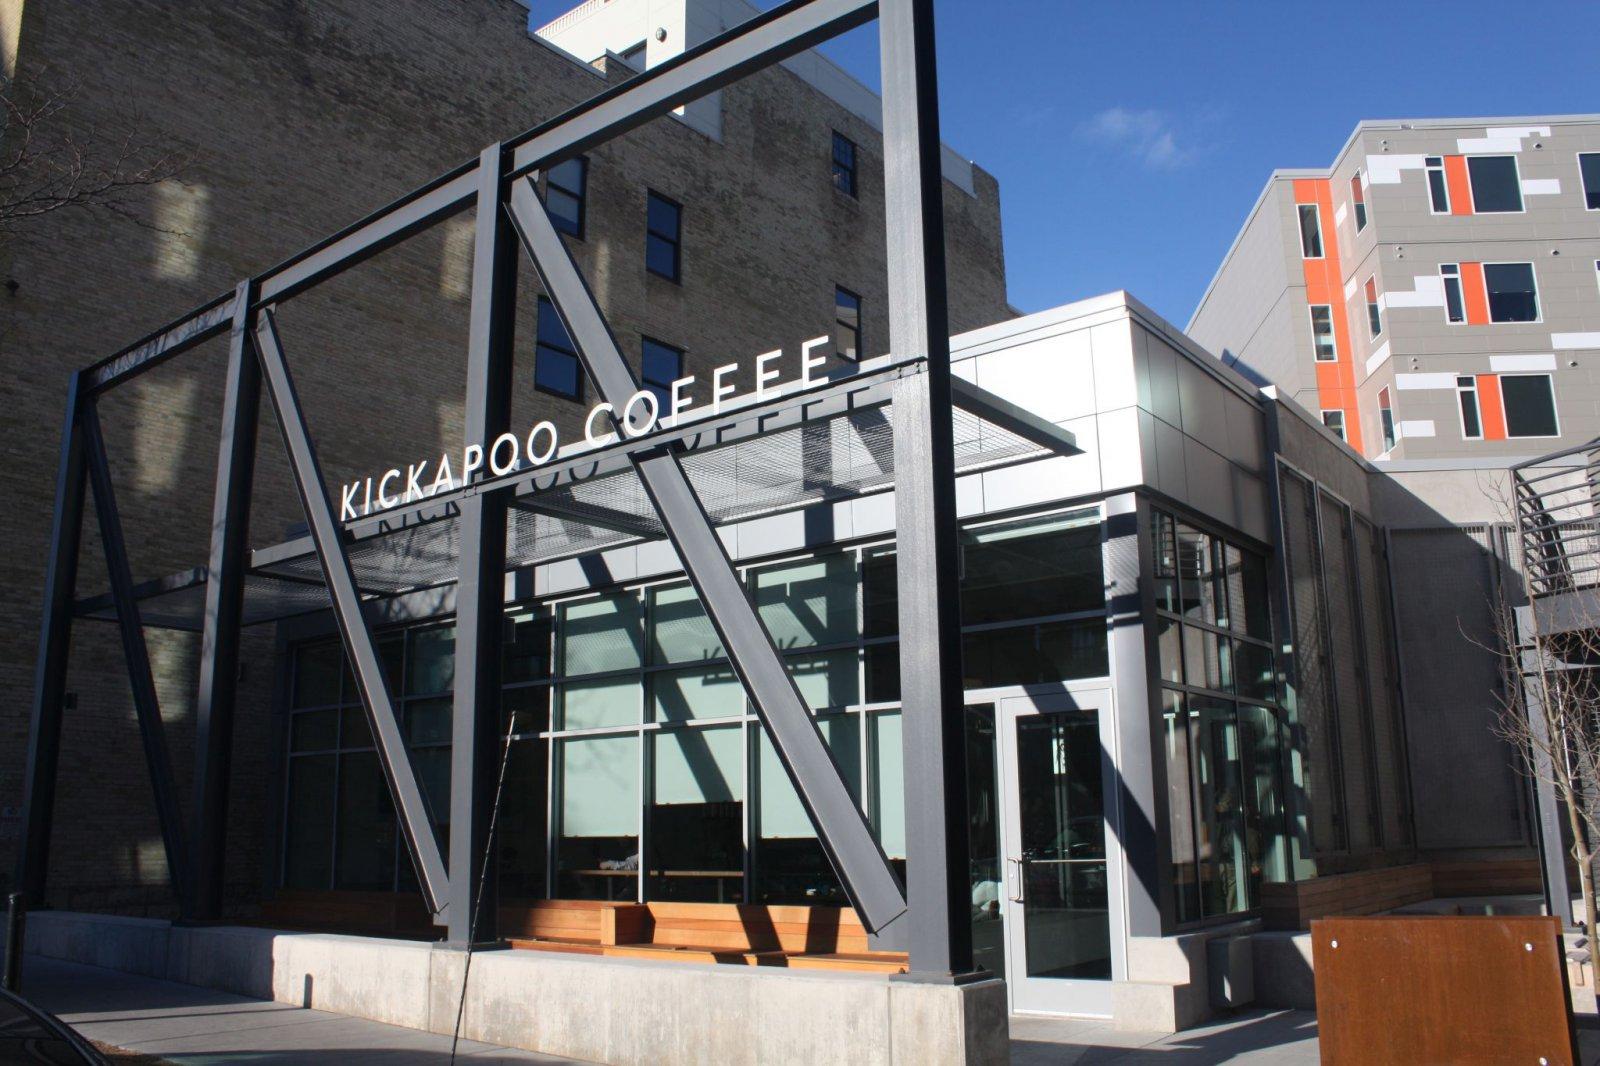 New coffee shop on E. Erie street